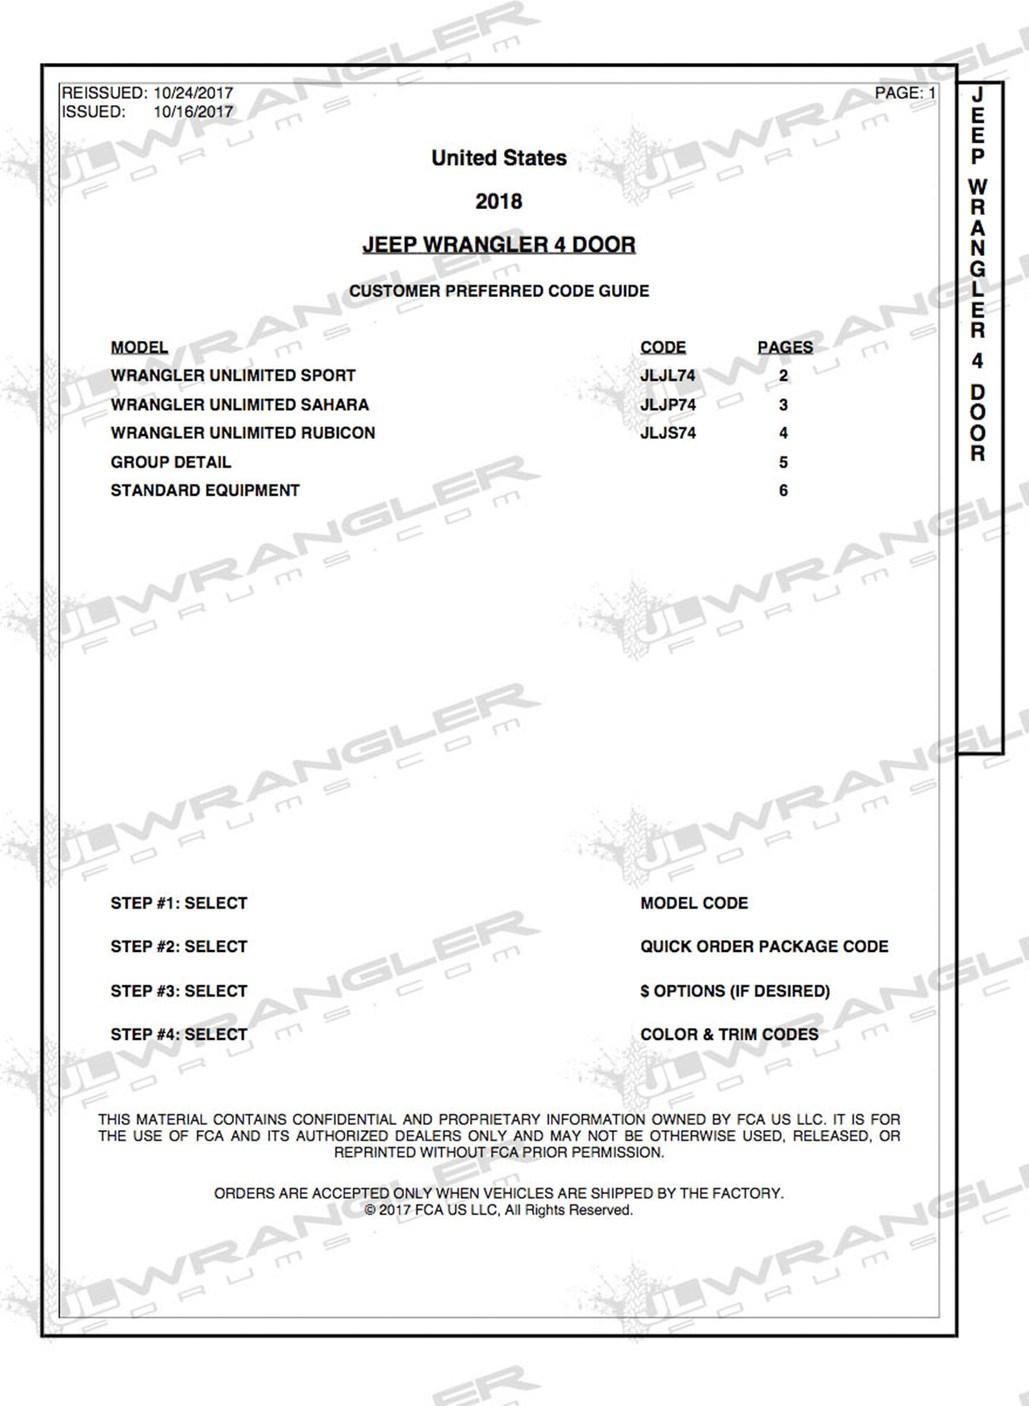 2018-jeep-wrangler-jlu-order-guide-10-24-17-01-1